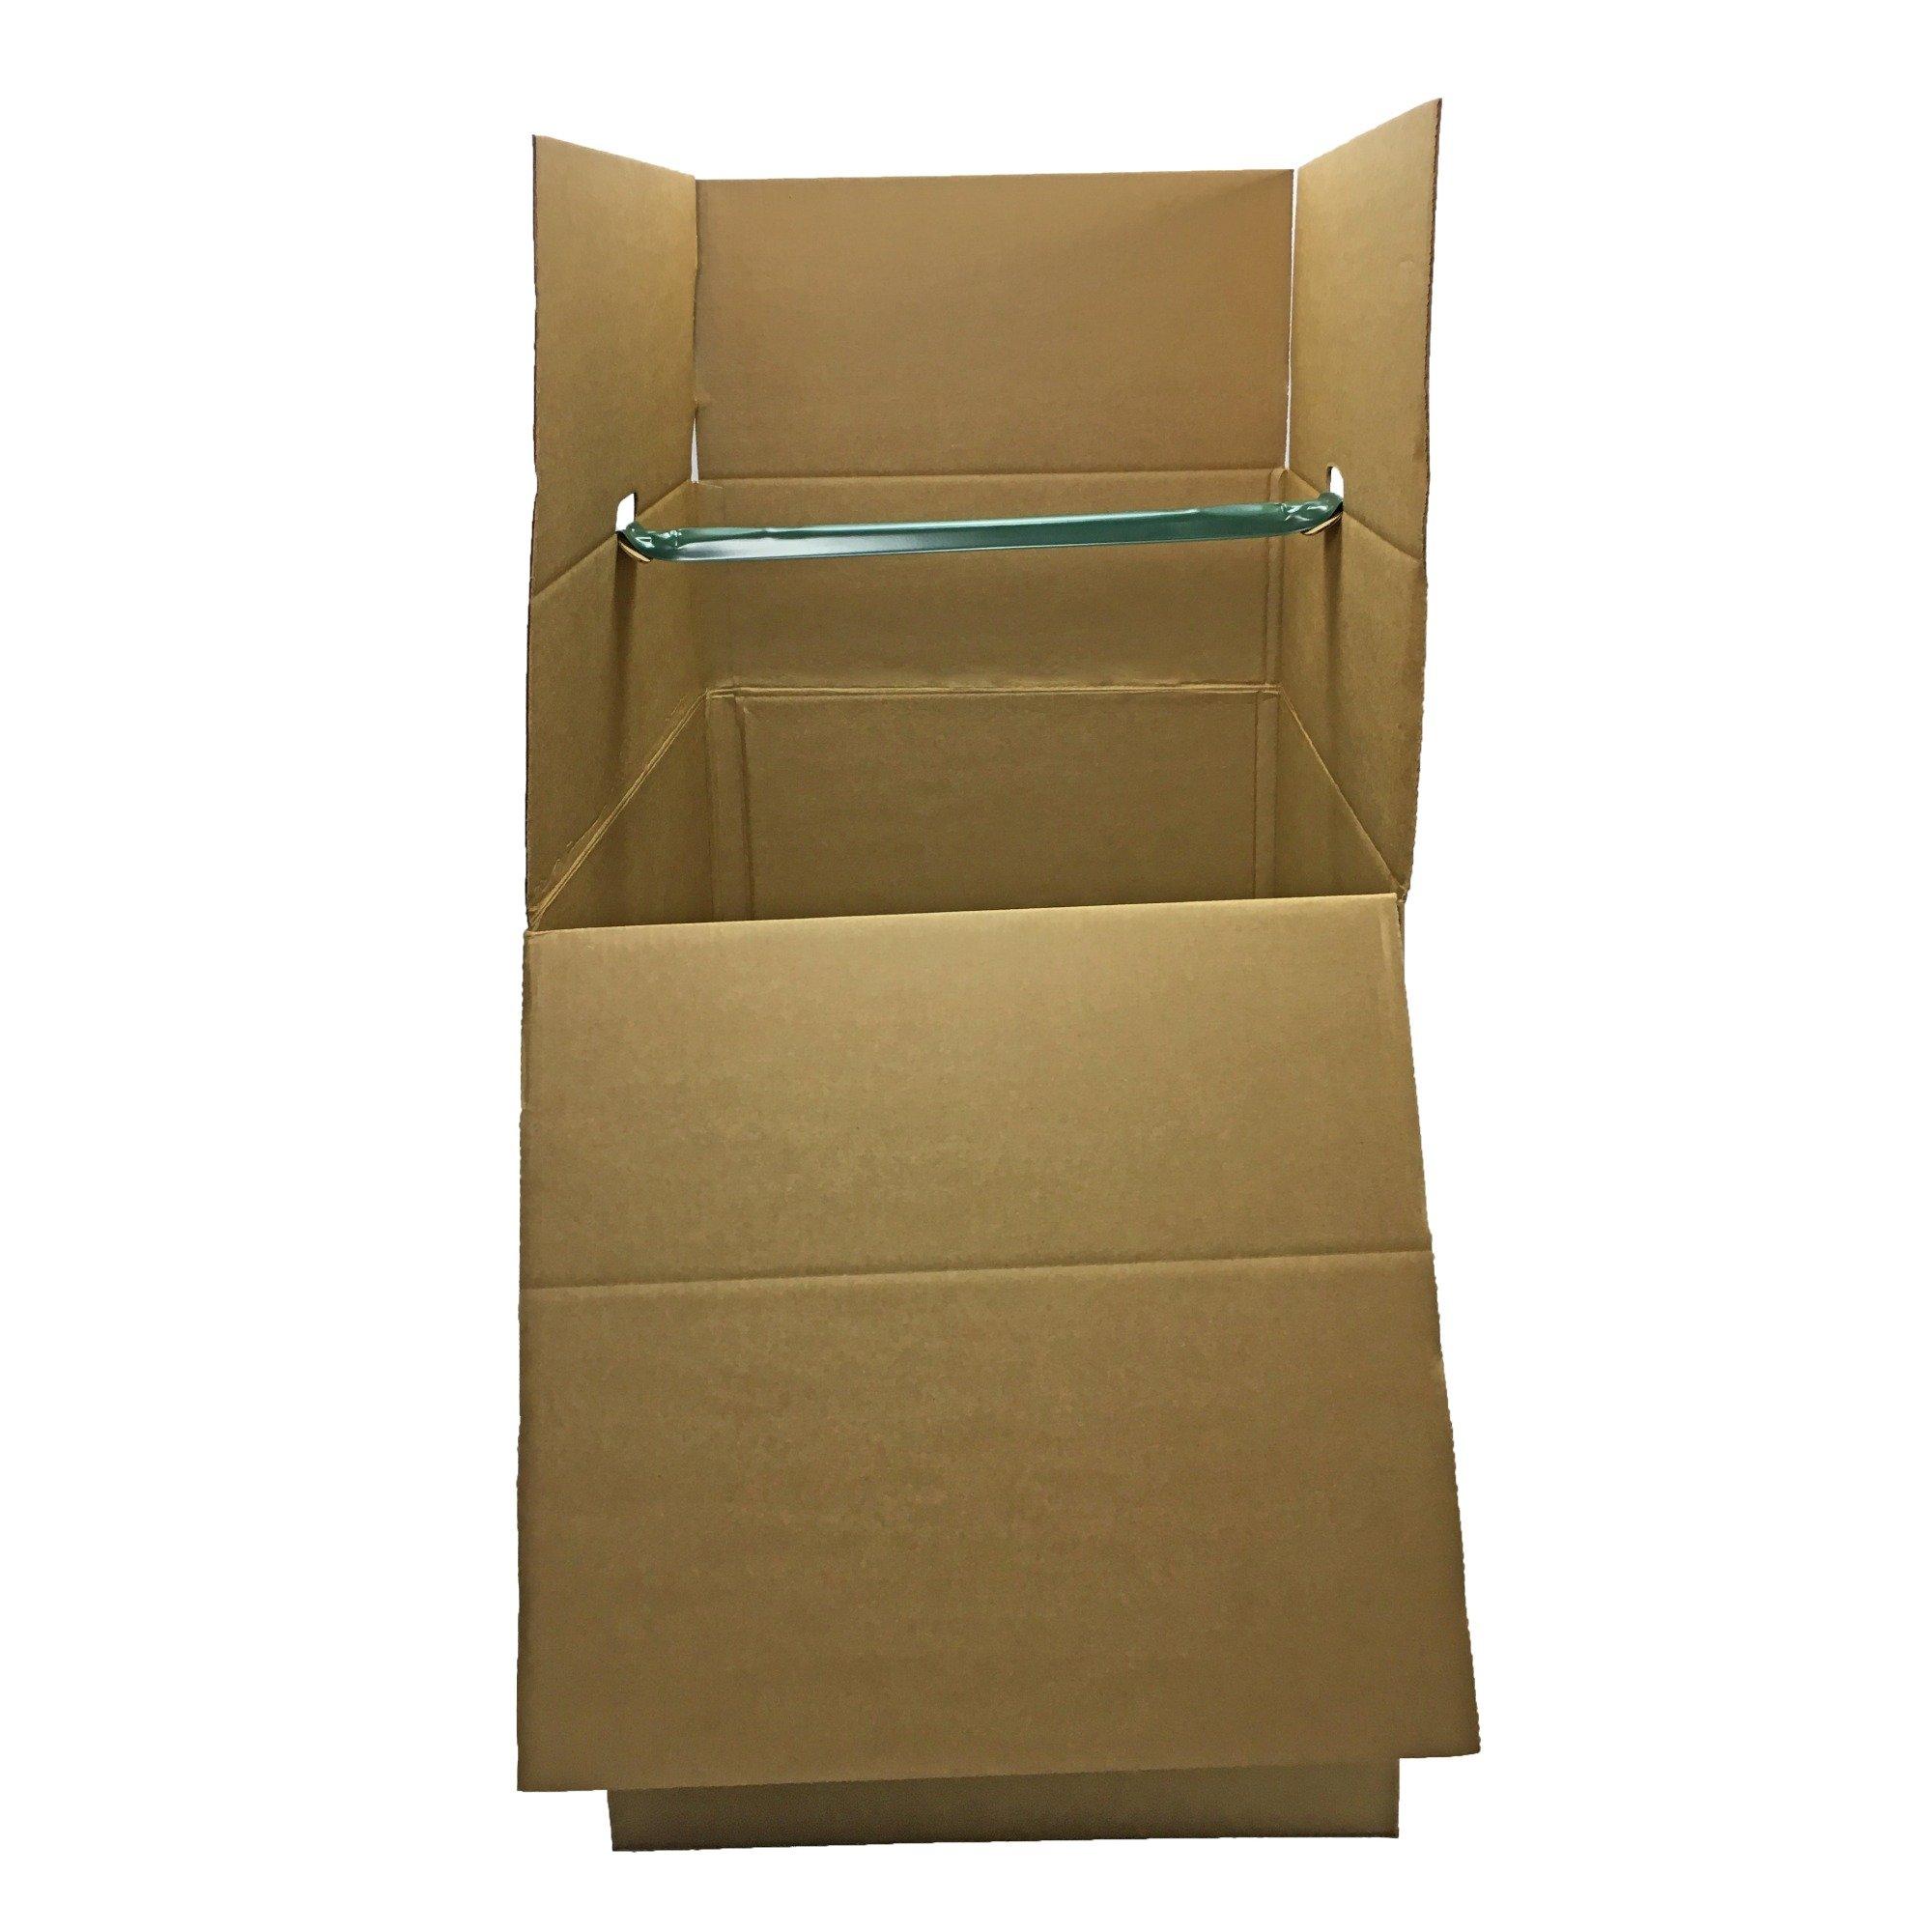 UBOXES Shorty Space Saving Wardrobe Moving Boxes 20 x 20 x 34 Inches Moving Boxes, 1-Pack, Kraft/Corrugated (BOXMINIWAR01)